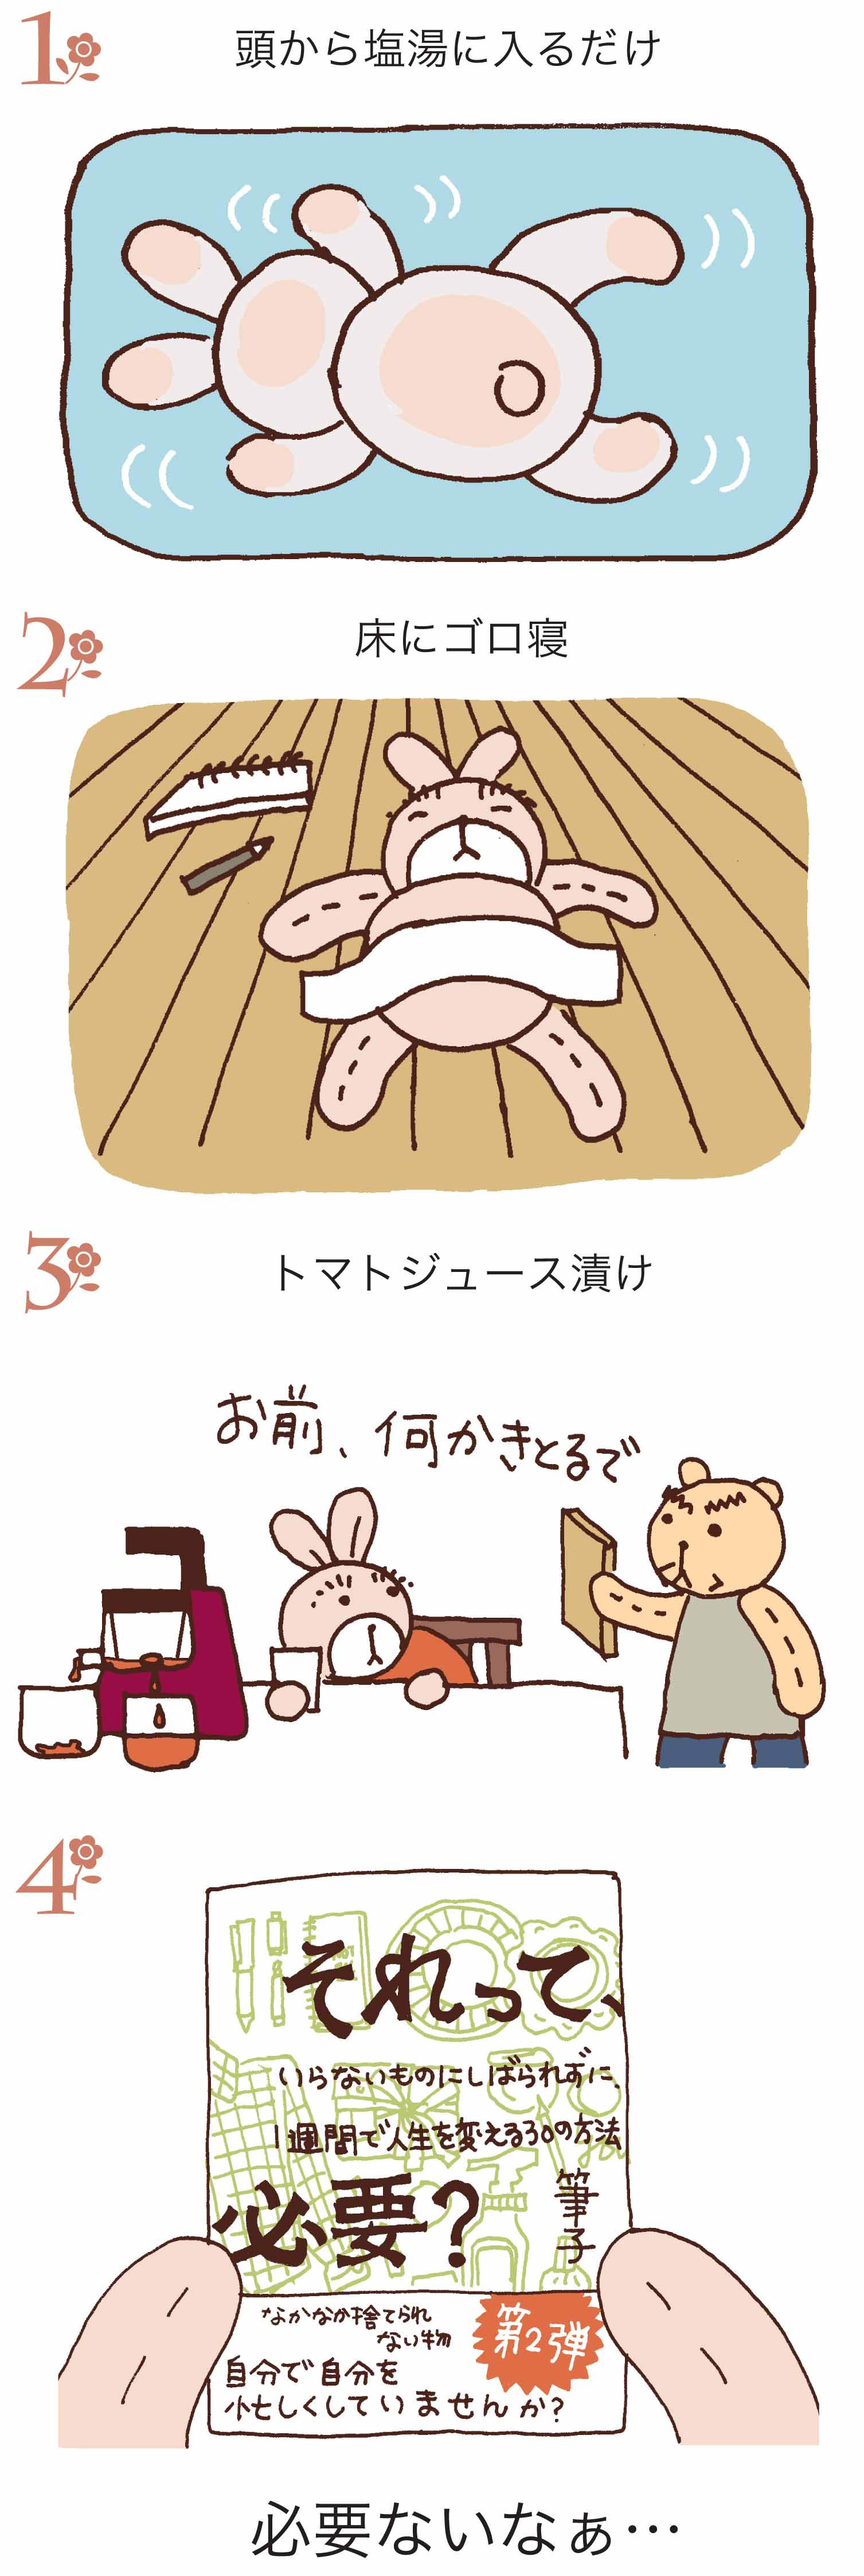 f108masausa